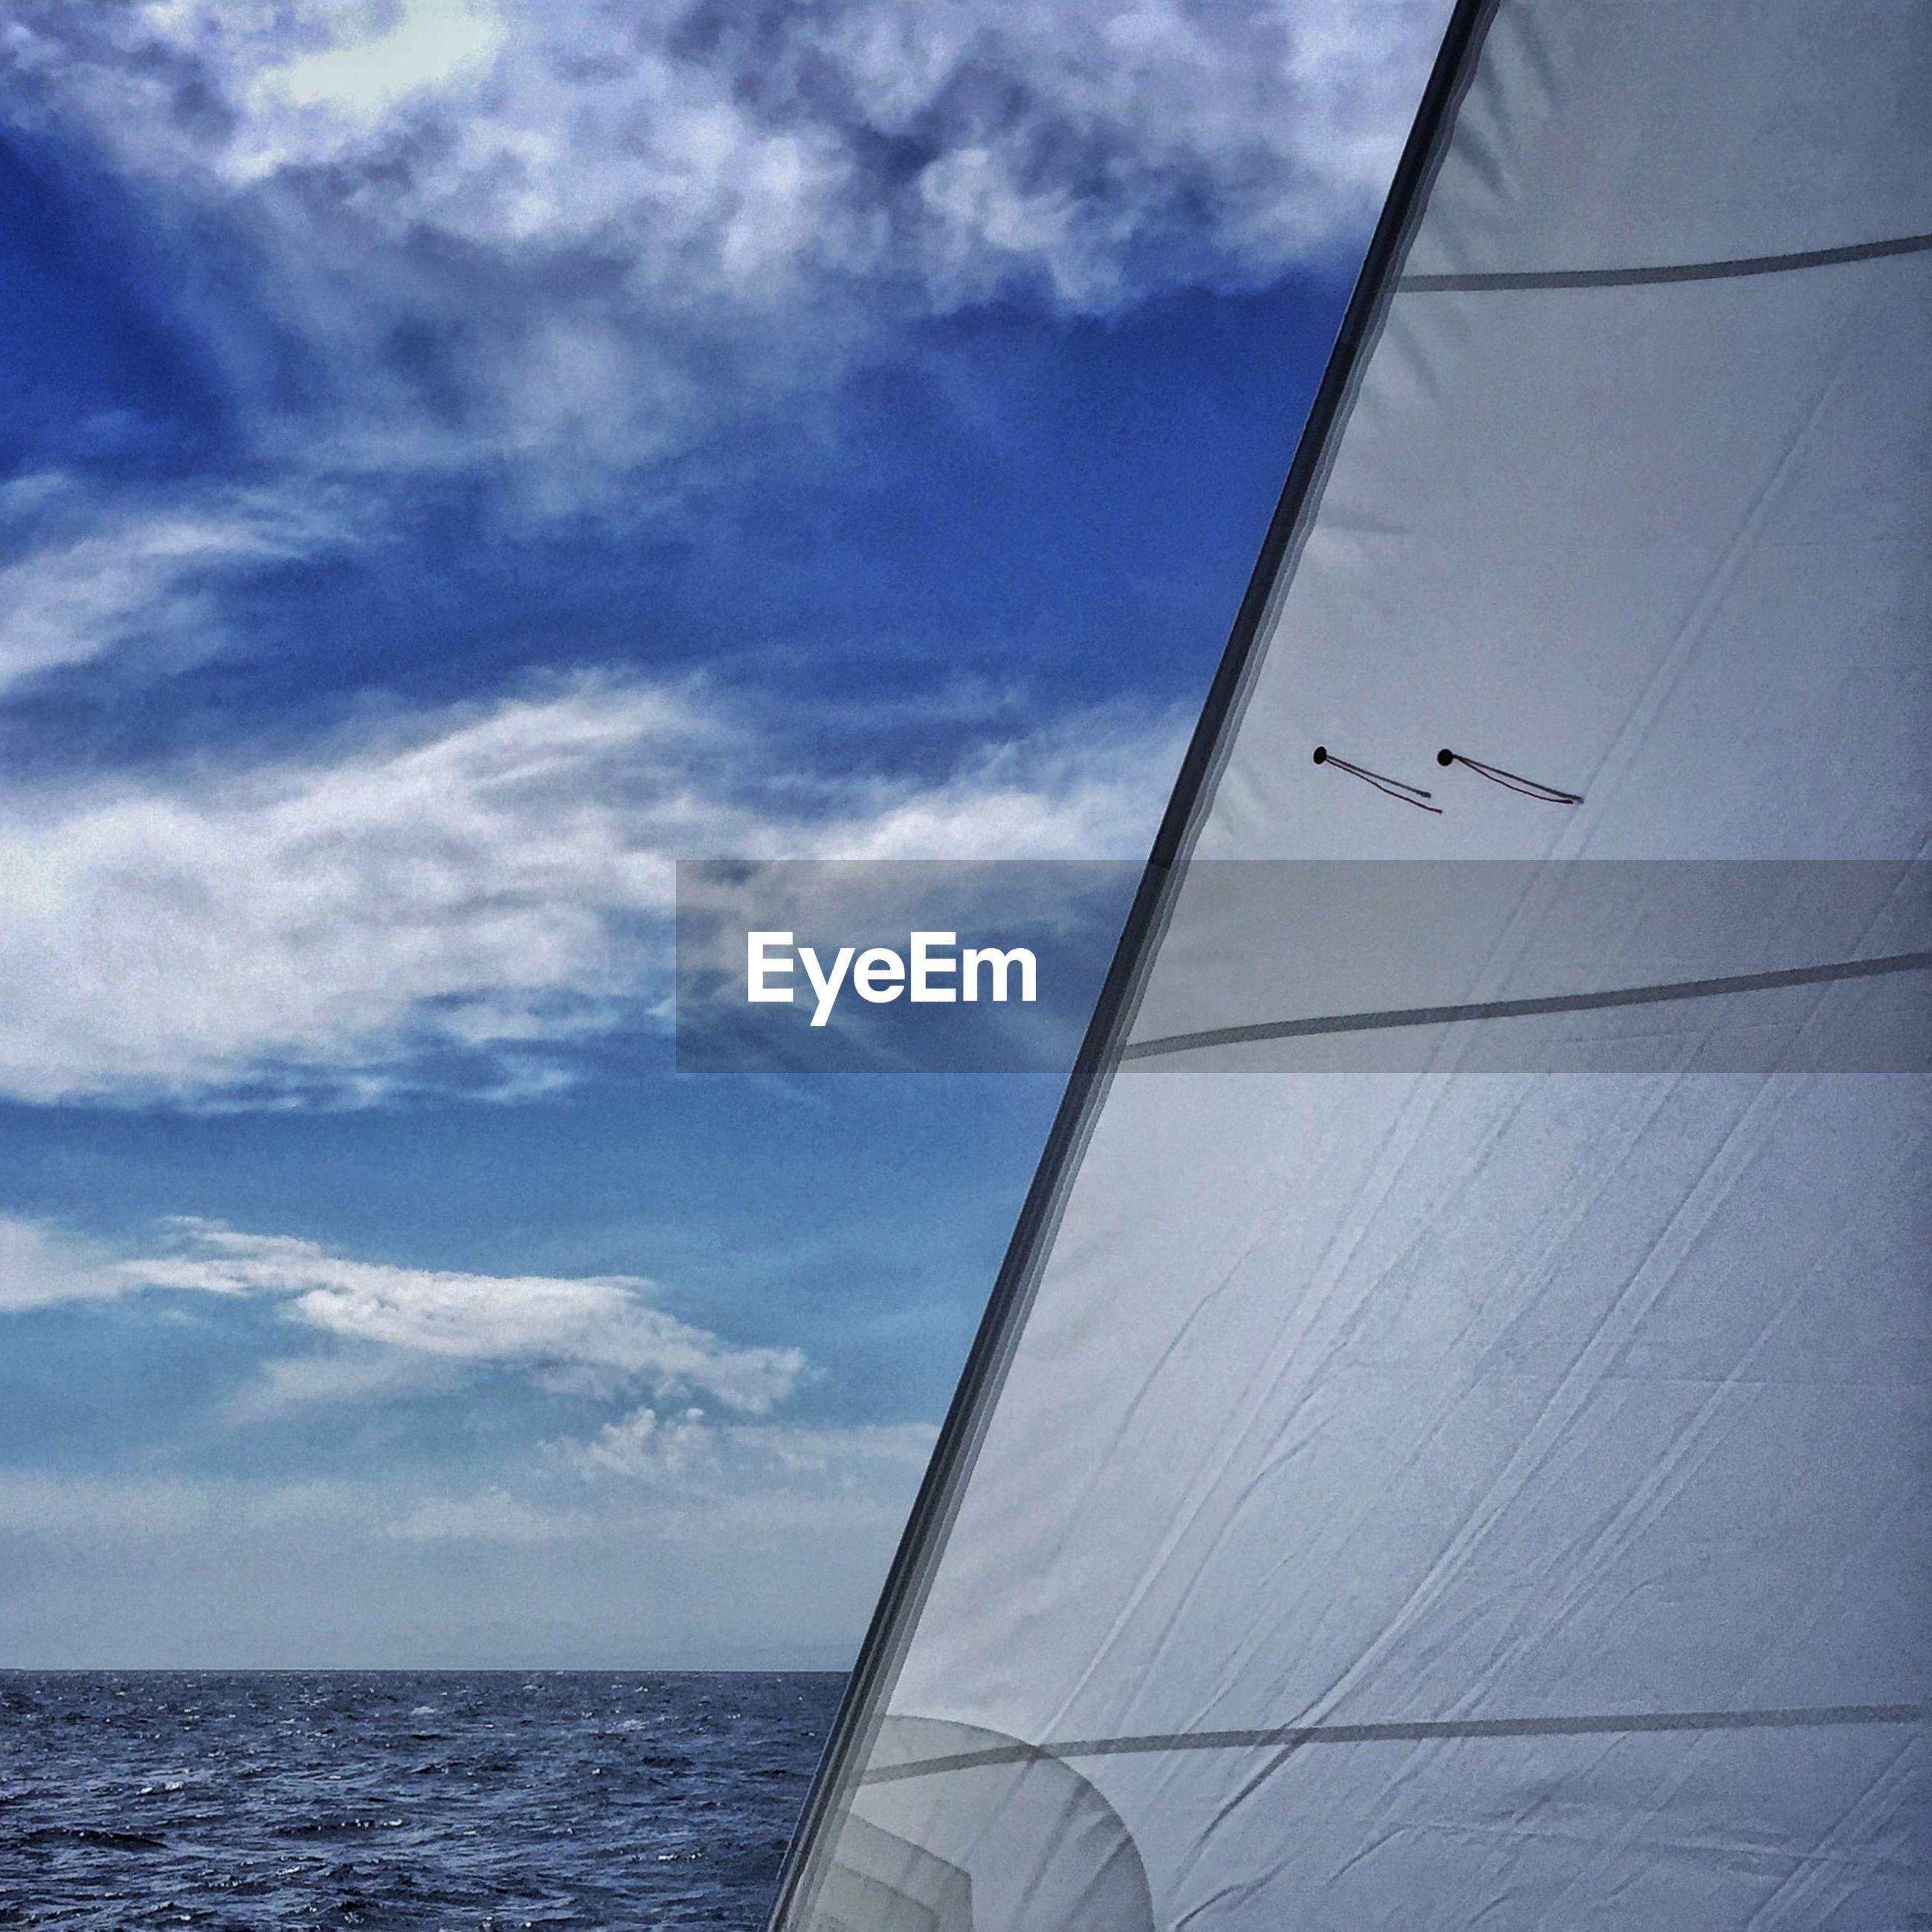 Tarpaulin sheet of sailboat on sea against wispy blue sky